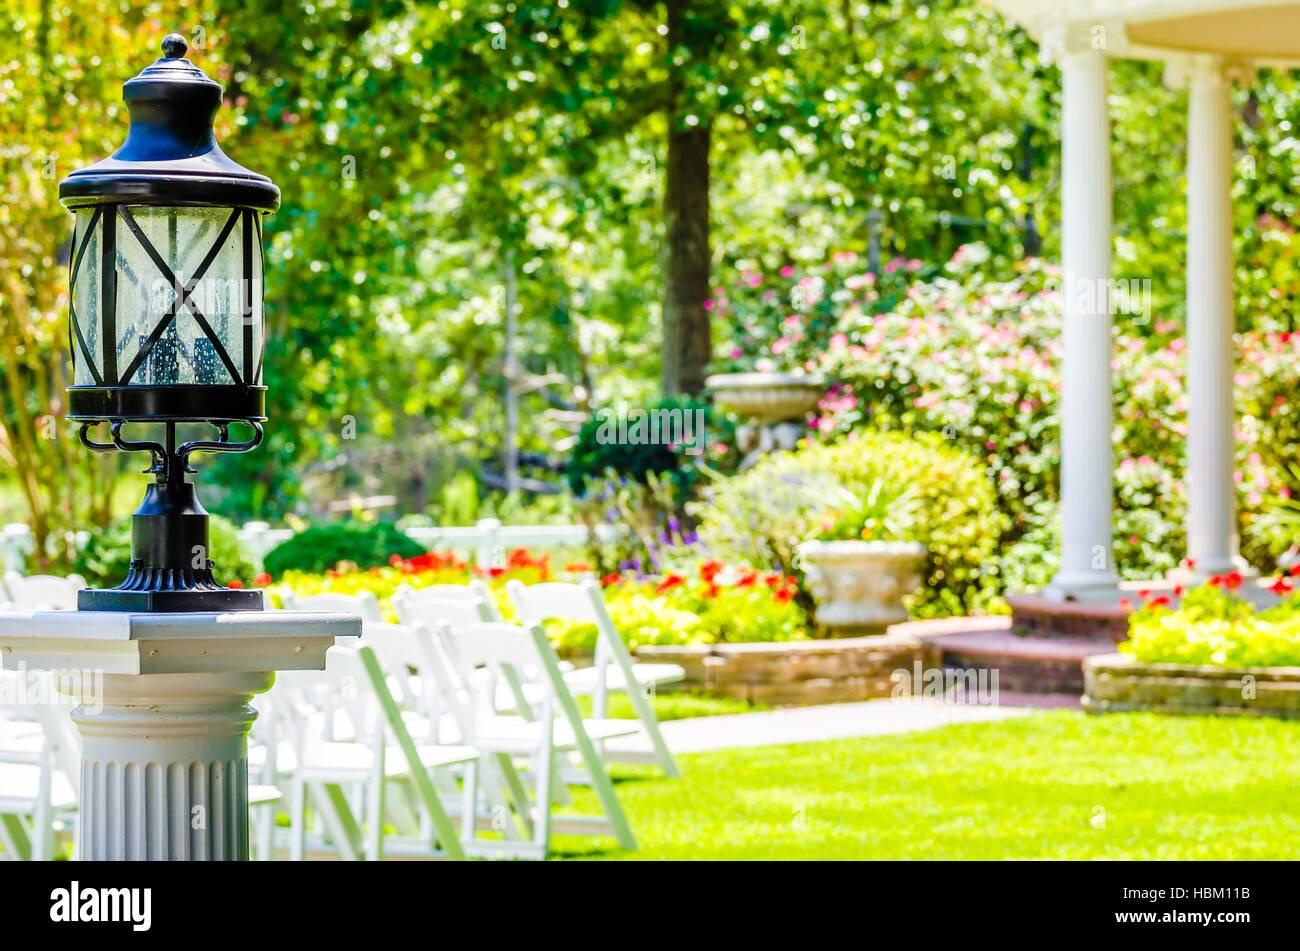 decorative classic lamp post in garden - Stock Image